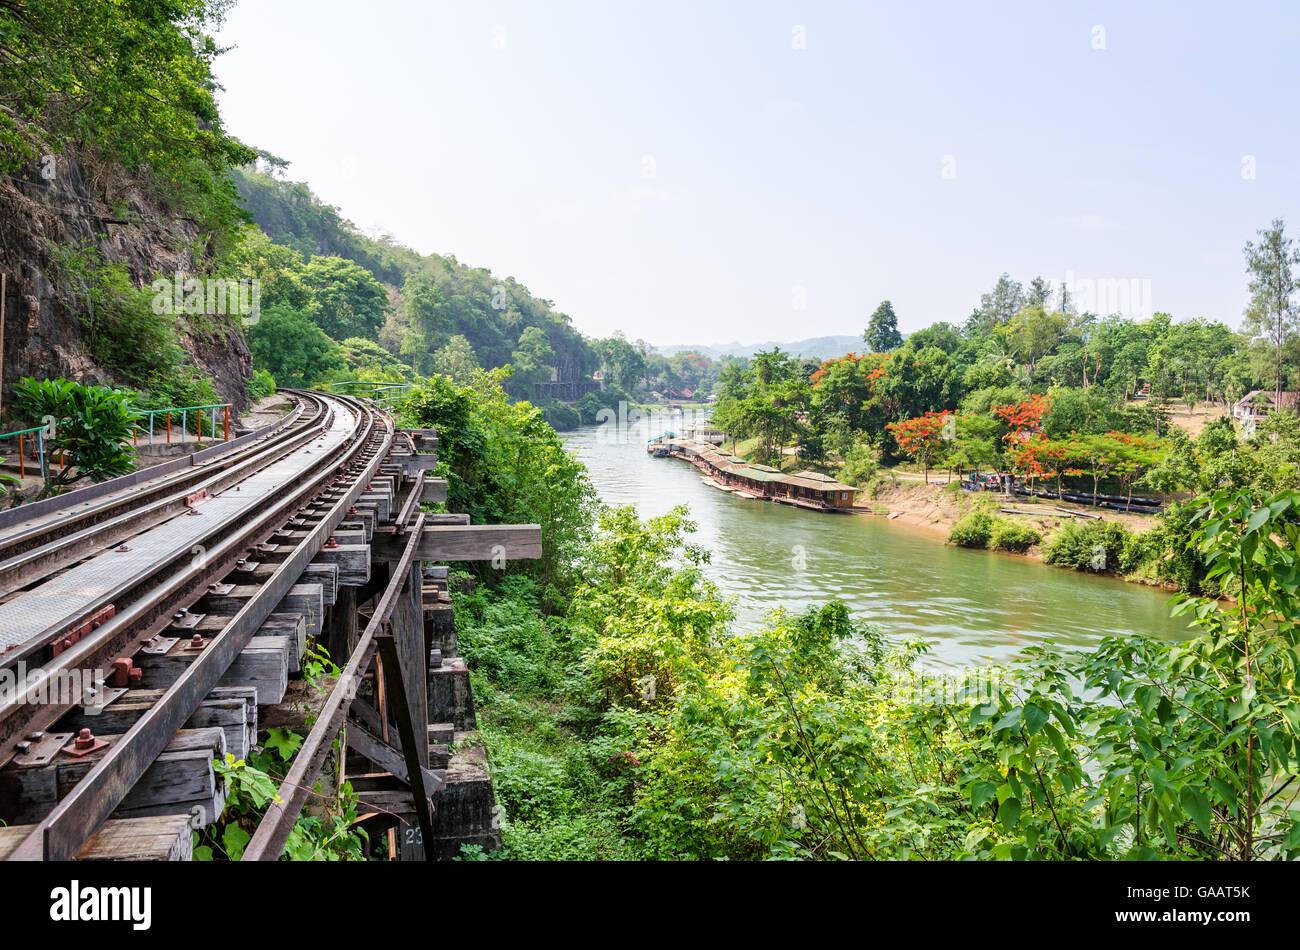 Beautiful landscape Death Railway bridge over the Kwai Noi River at Krasae cave in Kanchanaburi province Thailand - Stock Image